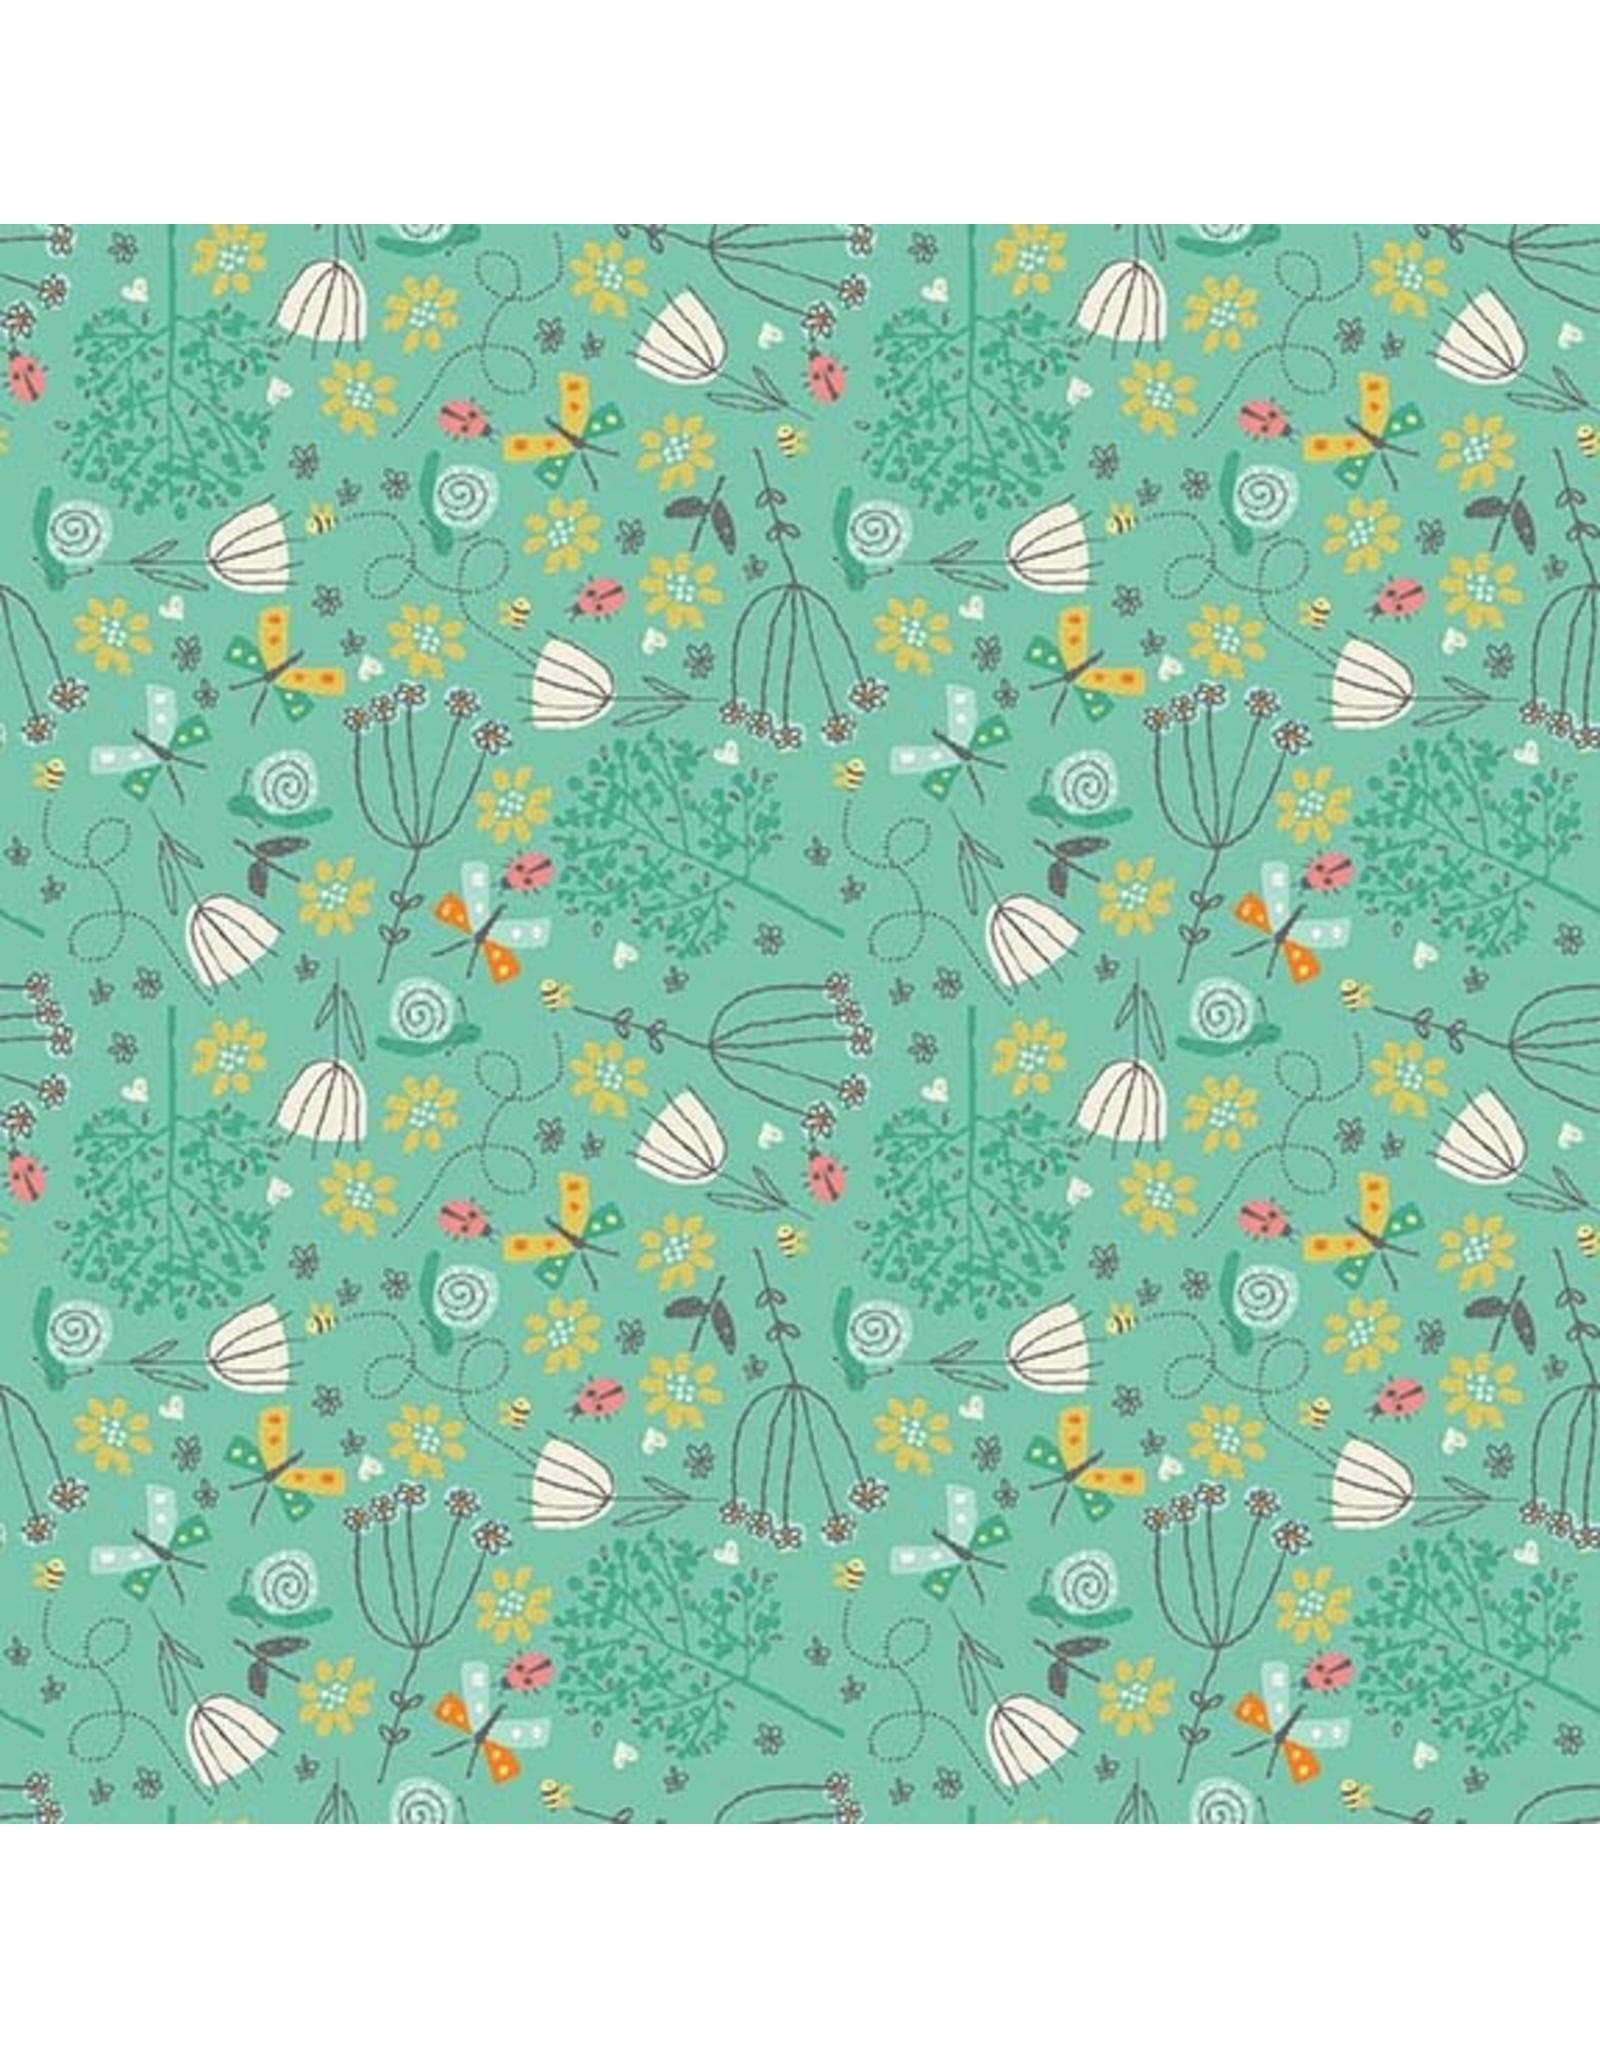 Makower UK A Walk in the Park - Flowers Mint